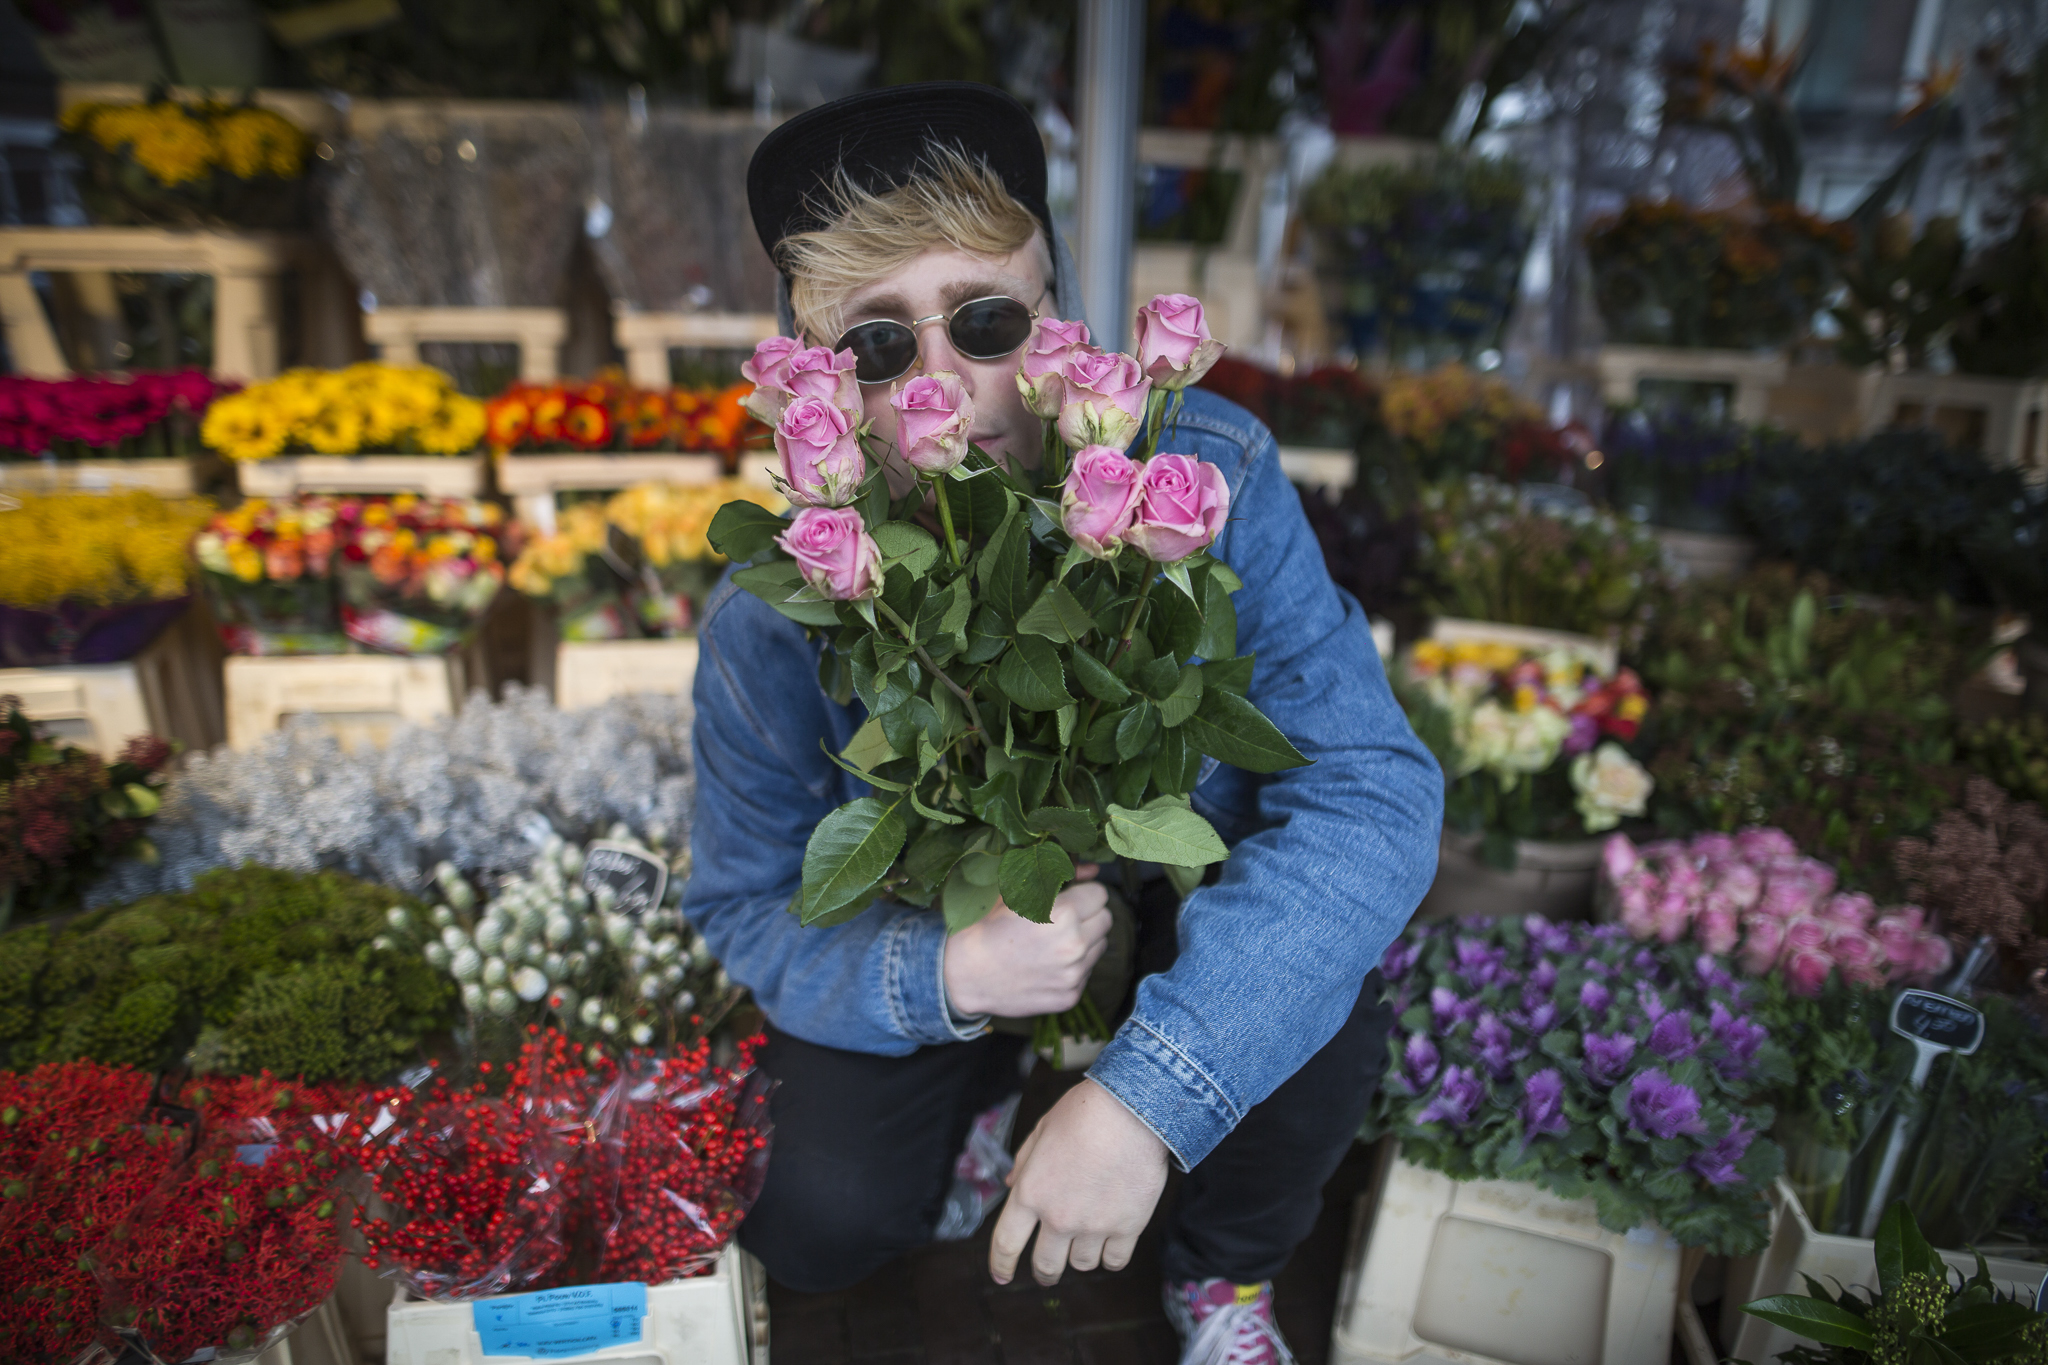 Één hoorn, tien rozen. Joost Klein - Amsterdam, 2016